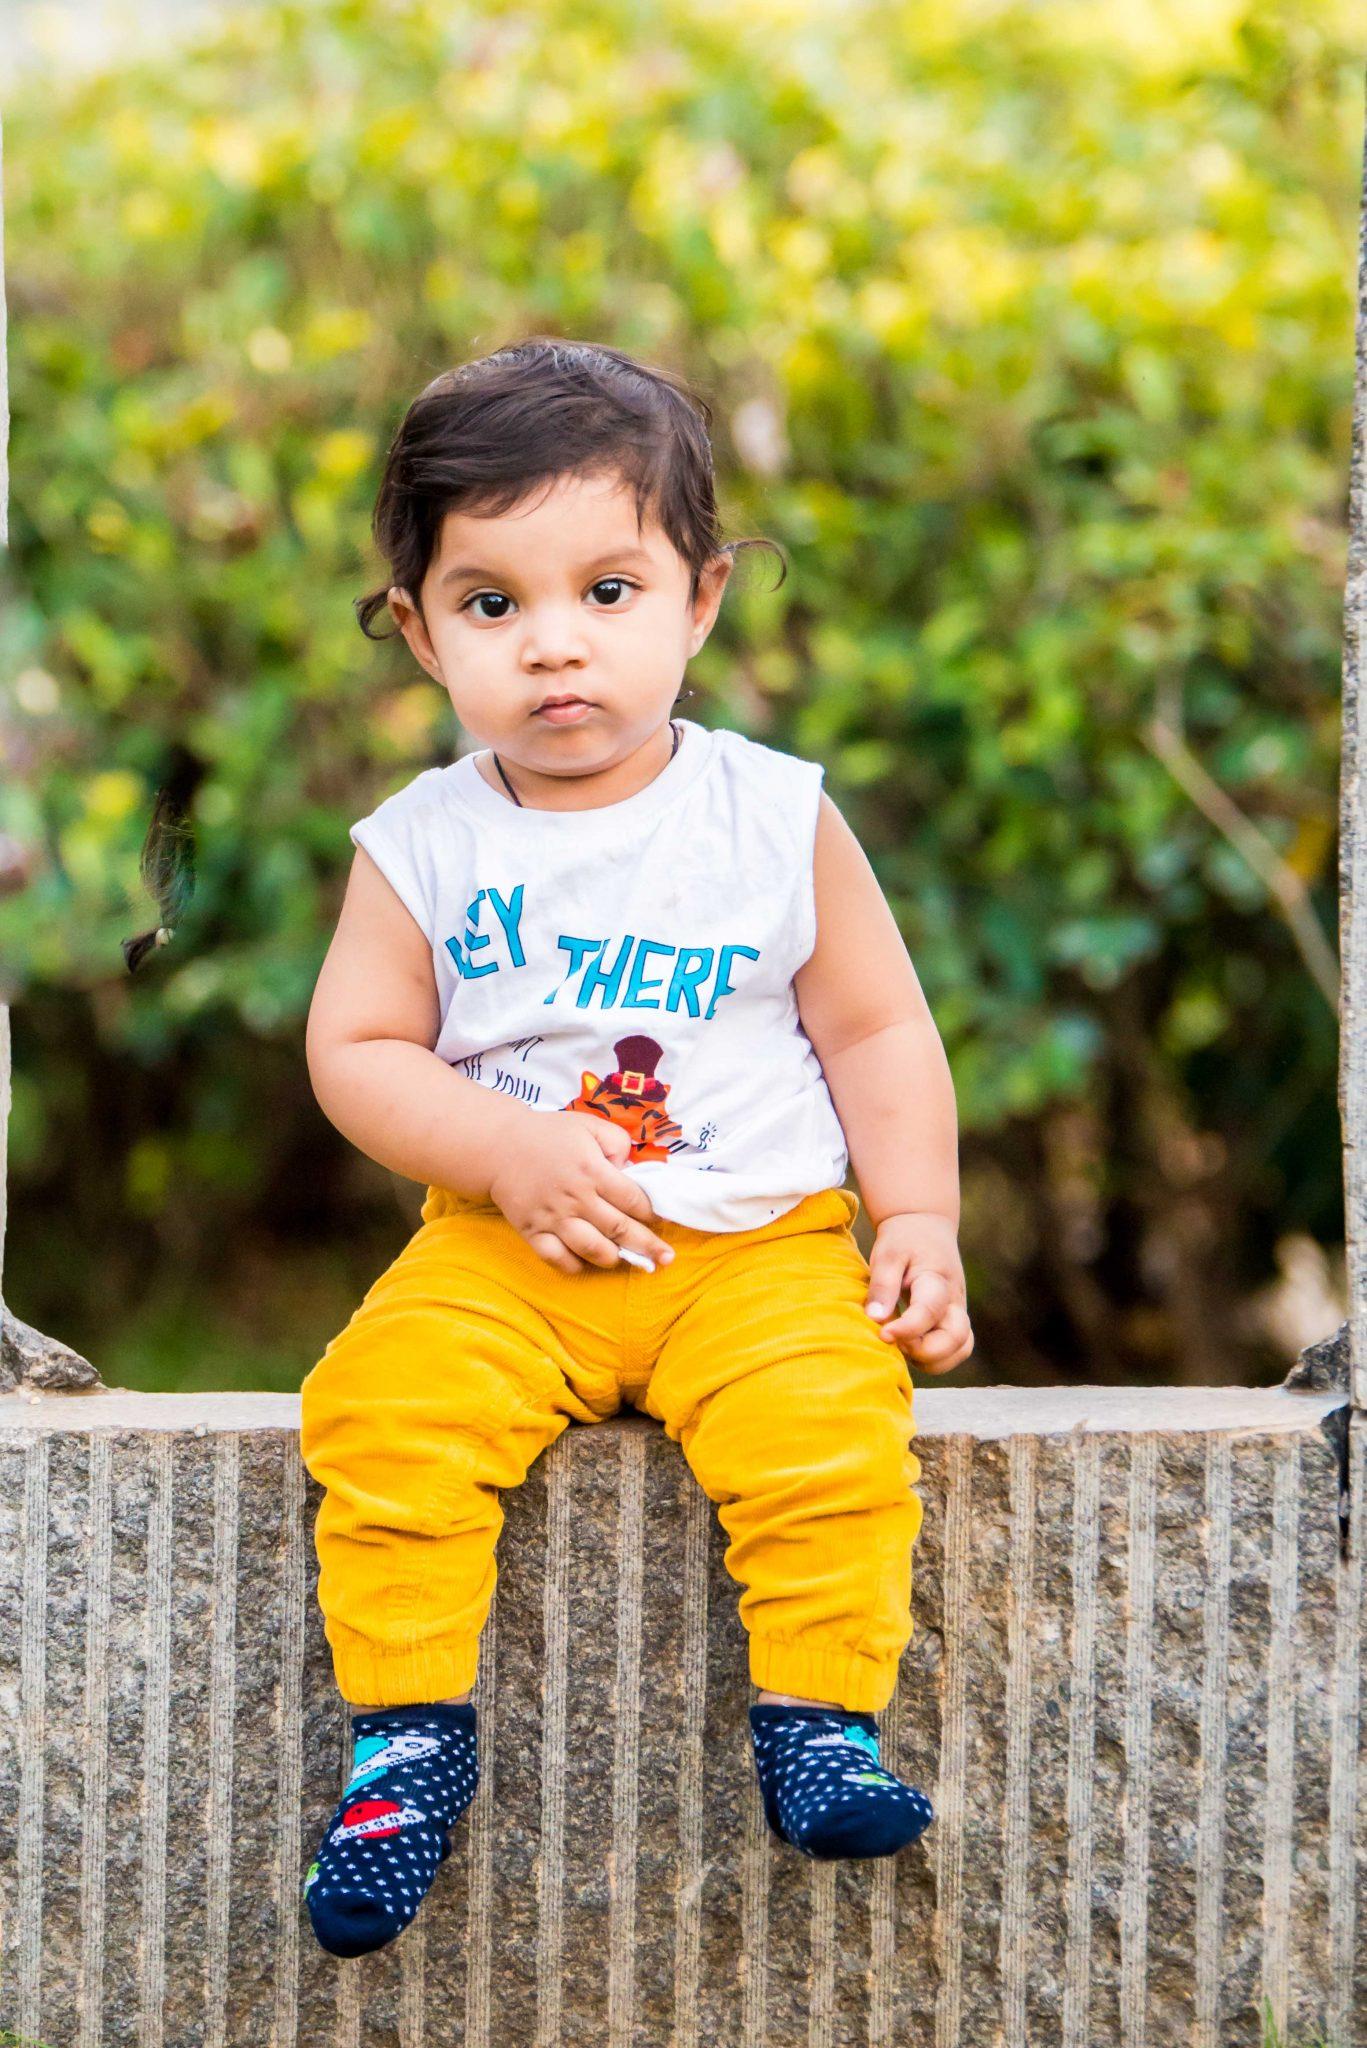 kids photoshoot kids photography baby boy photoshoot pre birthday photoshoot durgam cheruvu hyderabad